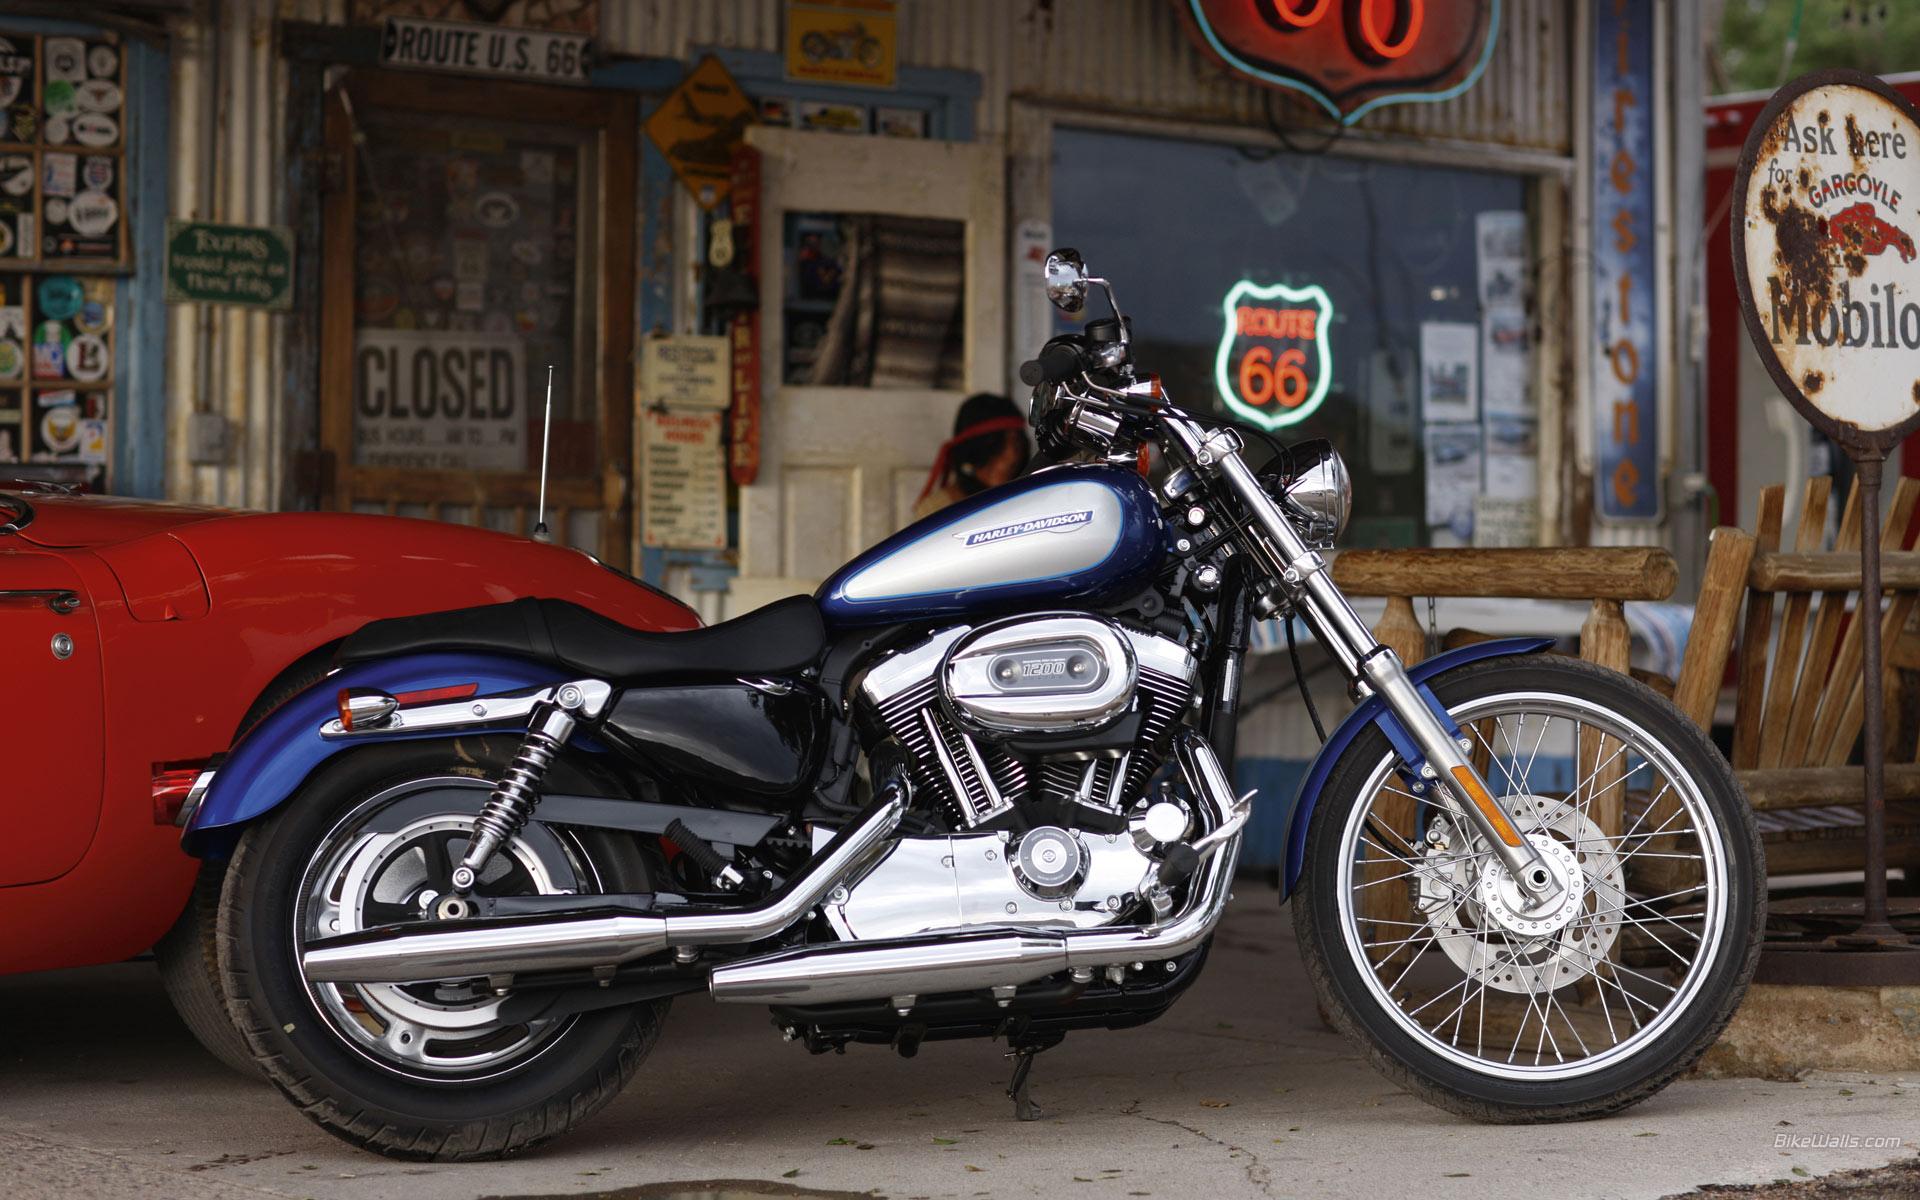 Harley Davidson Sportster 1200 wallpaper   447817 1920x1200